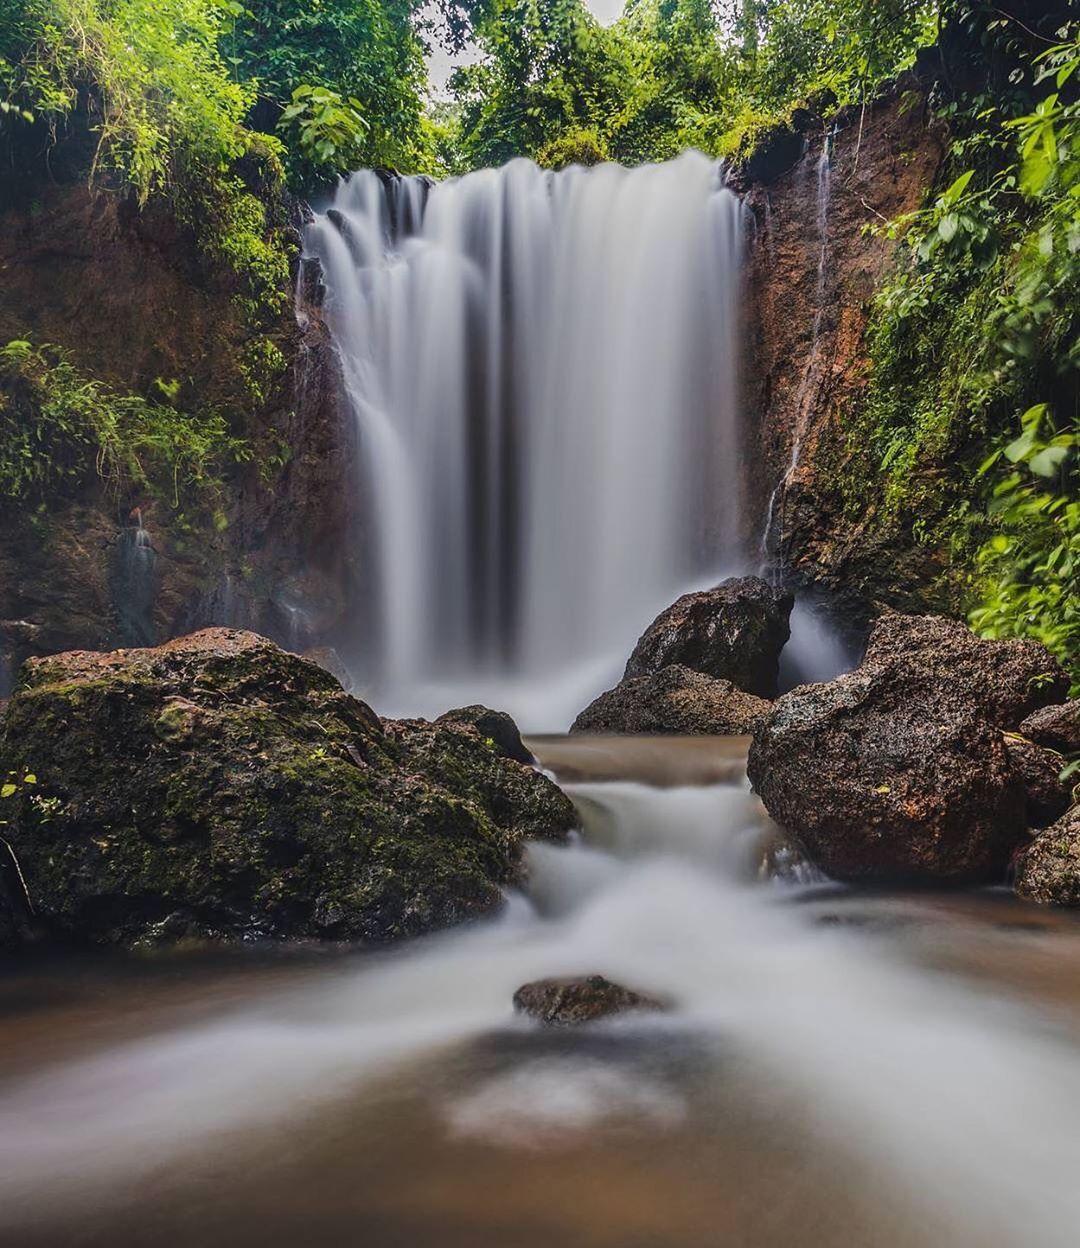 Kesarval Waterfalls